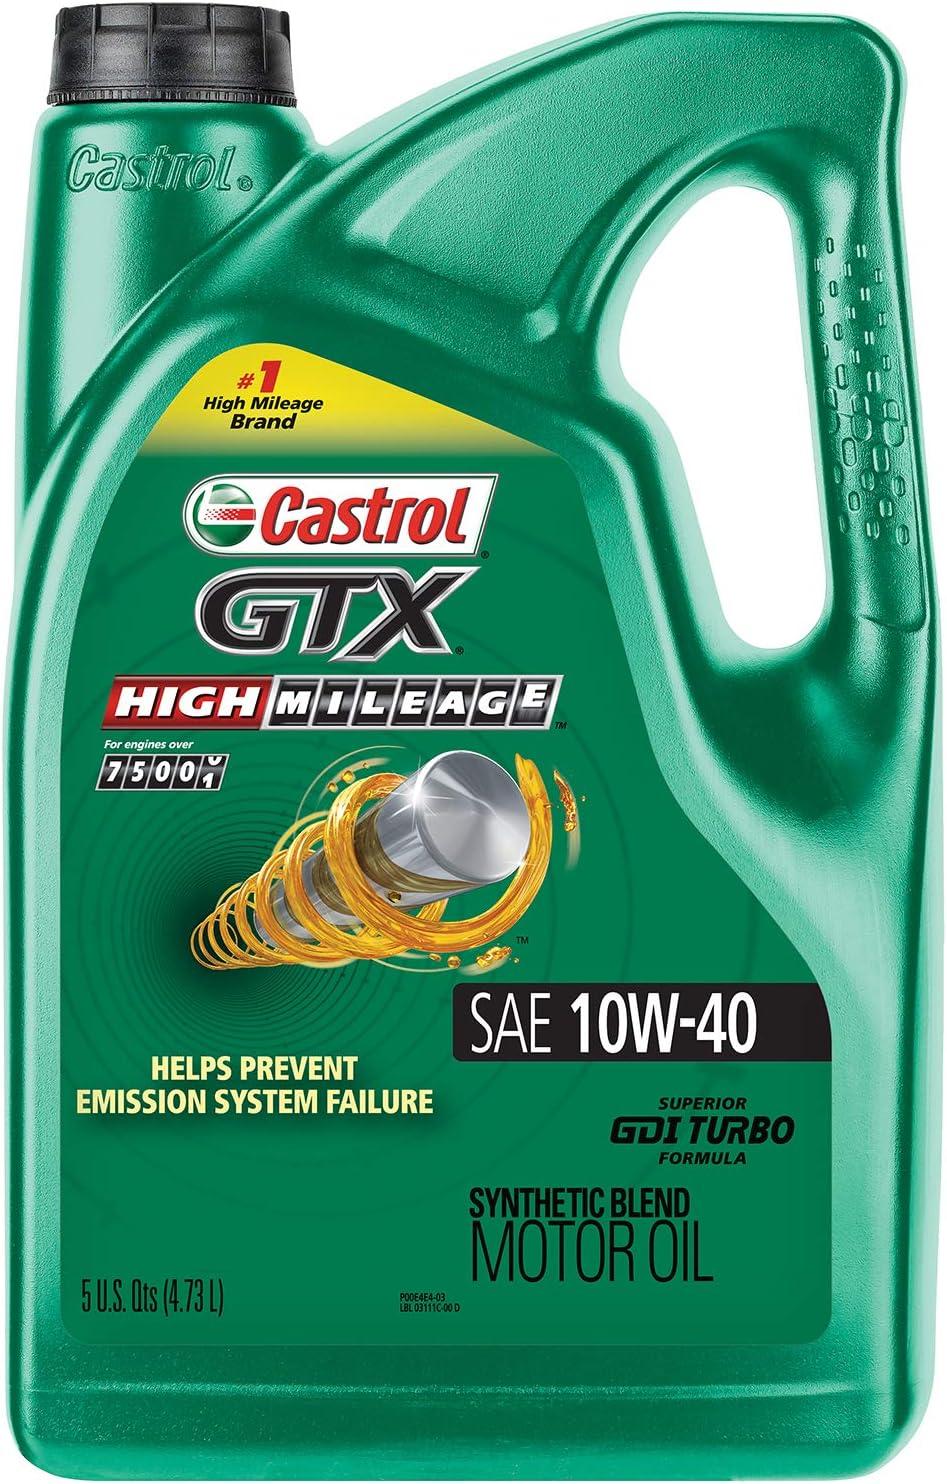 Castrol's GTX High-Mileage Oil